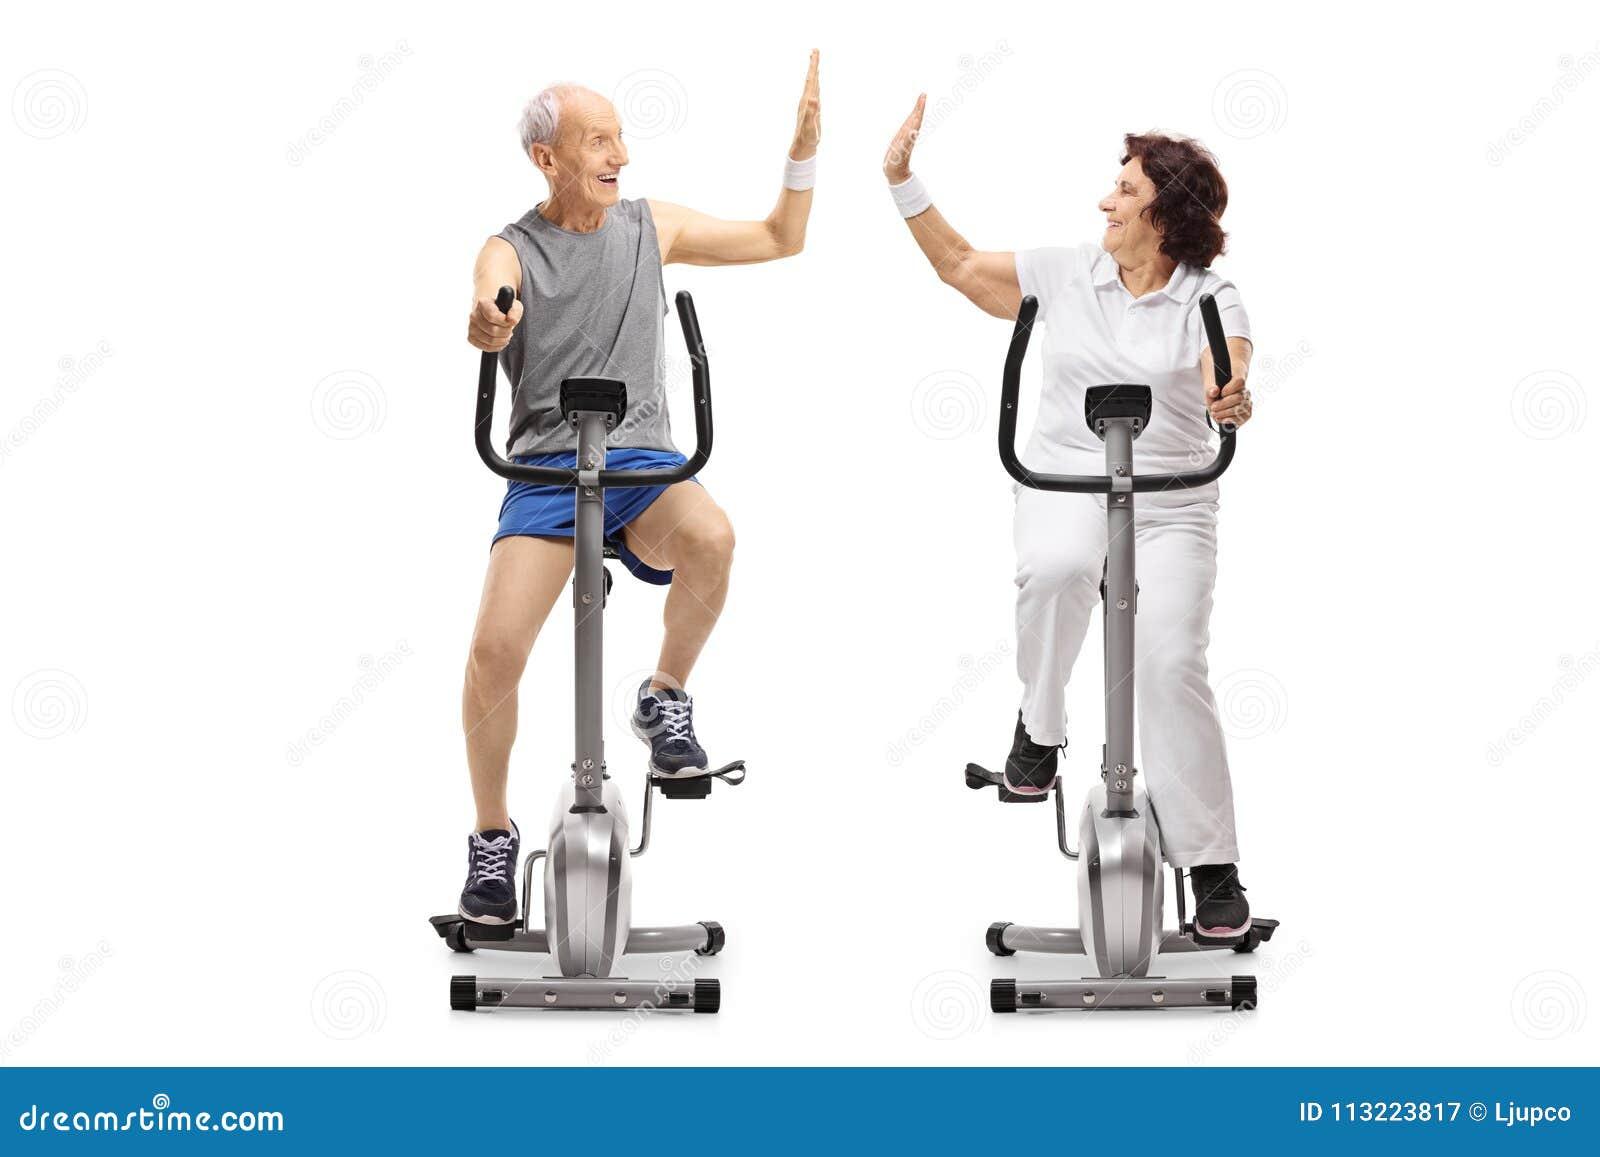 Seniors on exercise bikes high-fiving each other